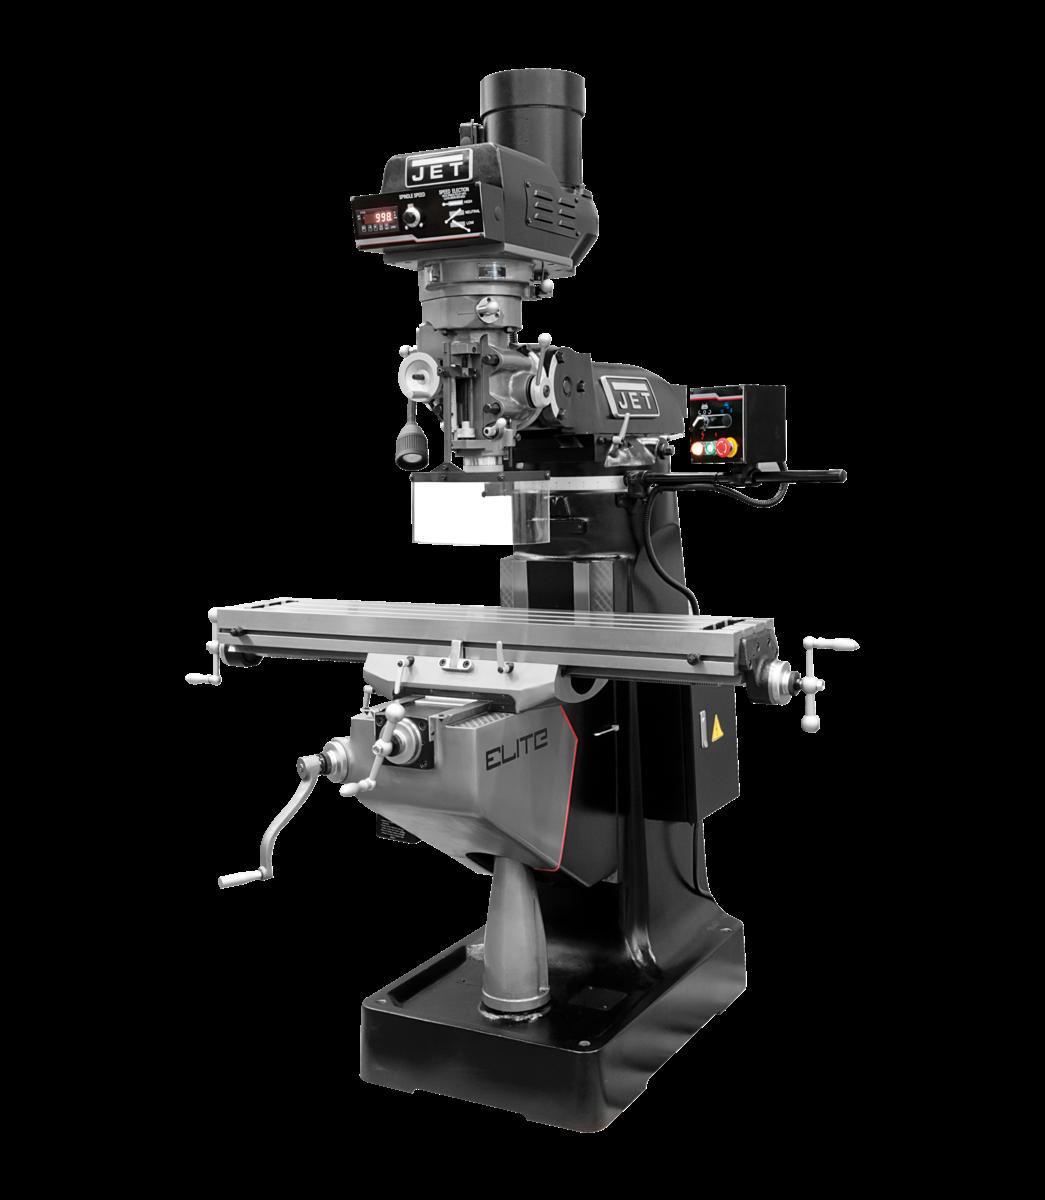 ETM-949 W/2-AXIS MILLPWR